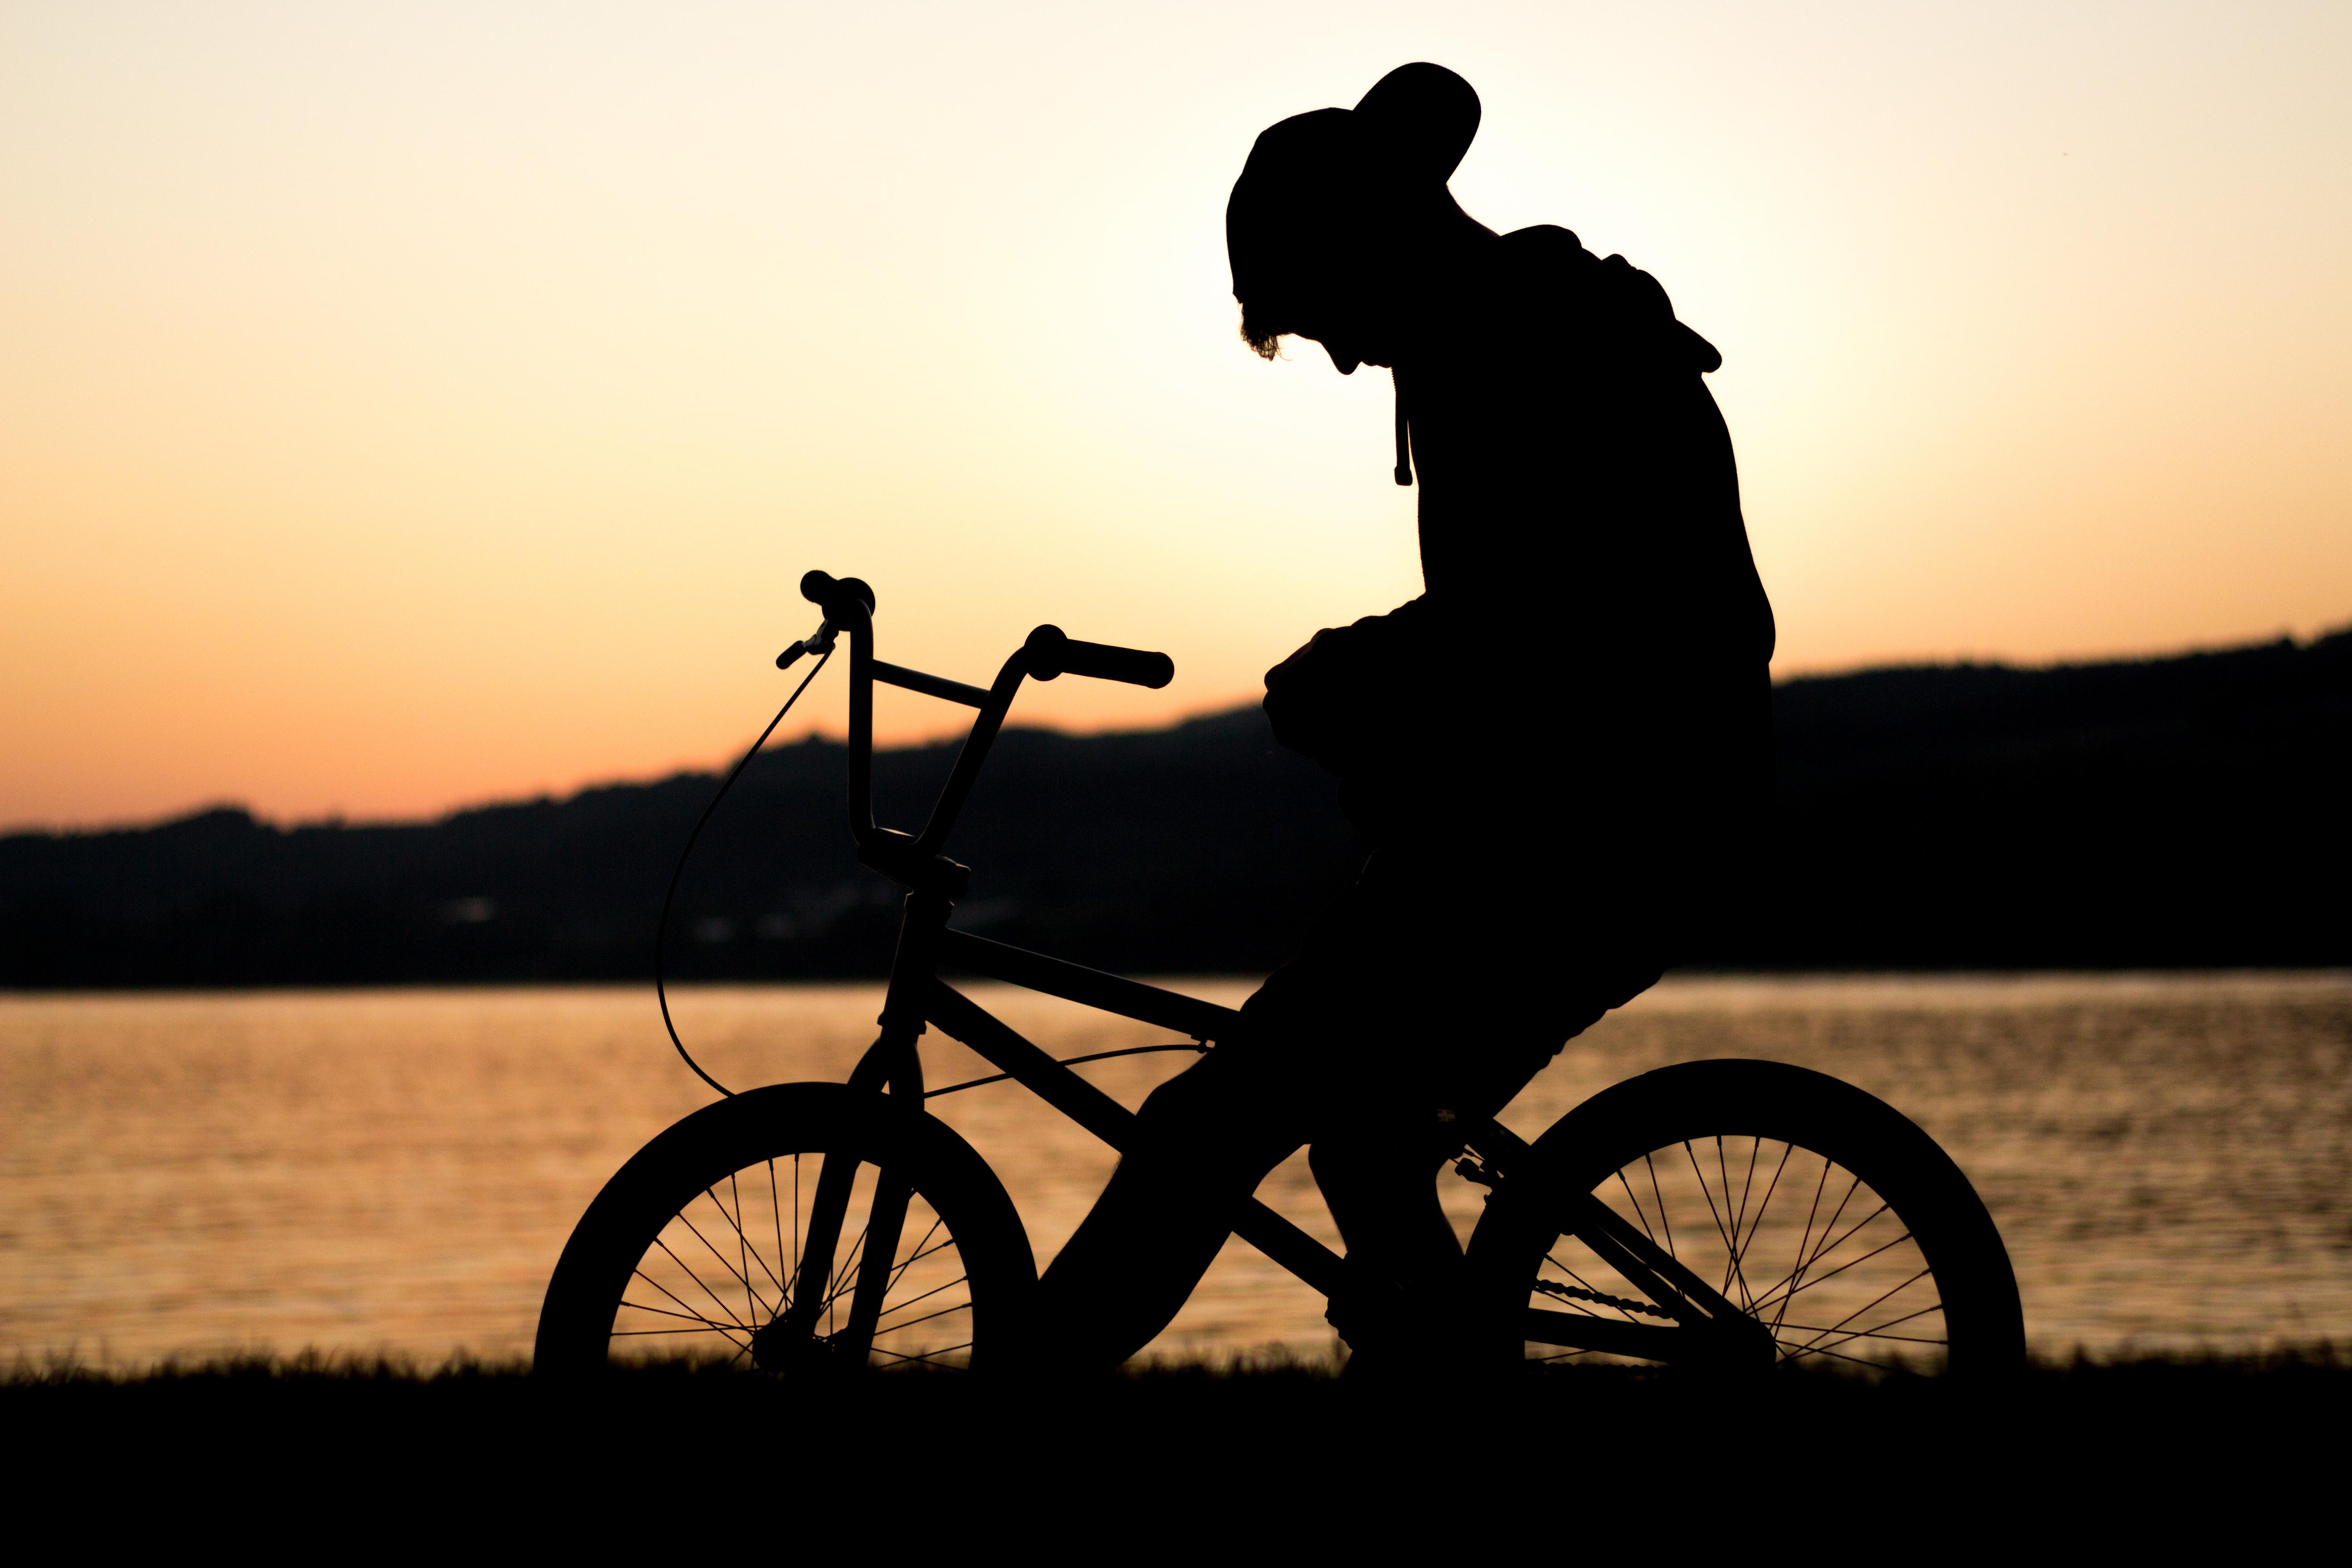 Днем, картинки мужчина на велосипеде